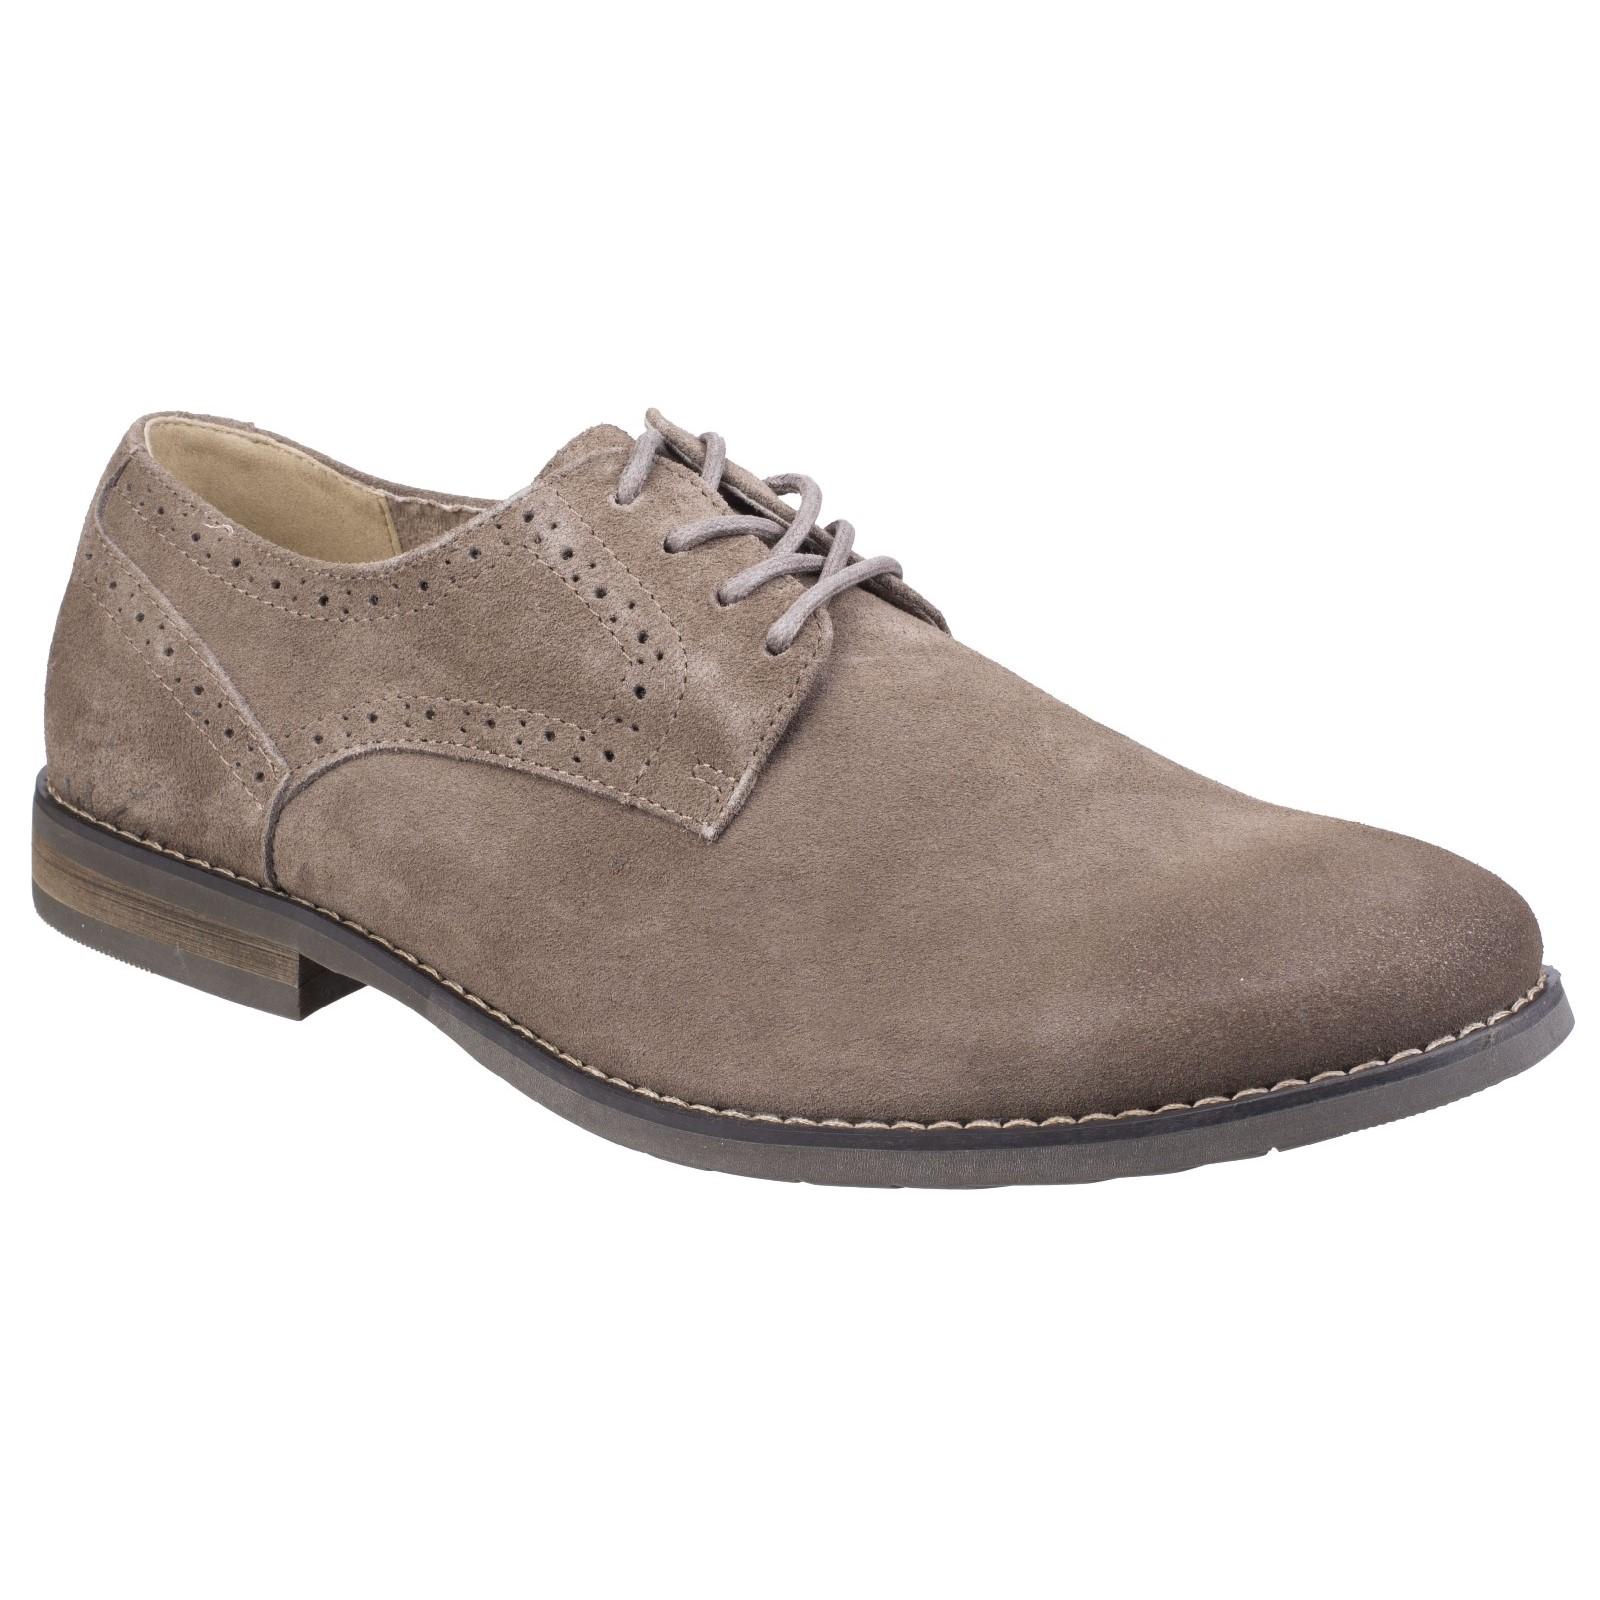 Hush Puppies Mens Sean Casual Plain Toe shoes